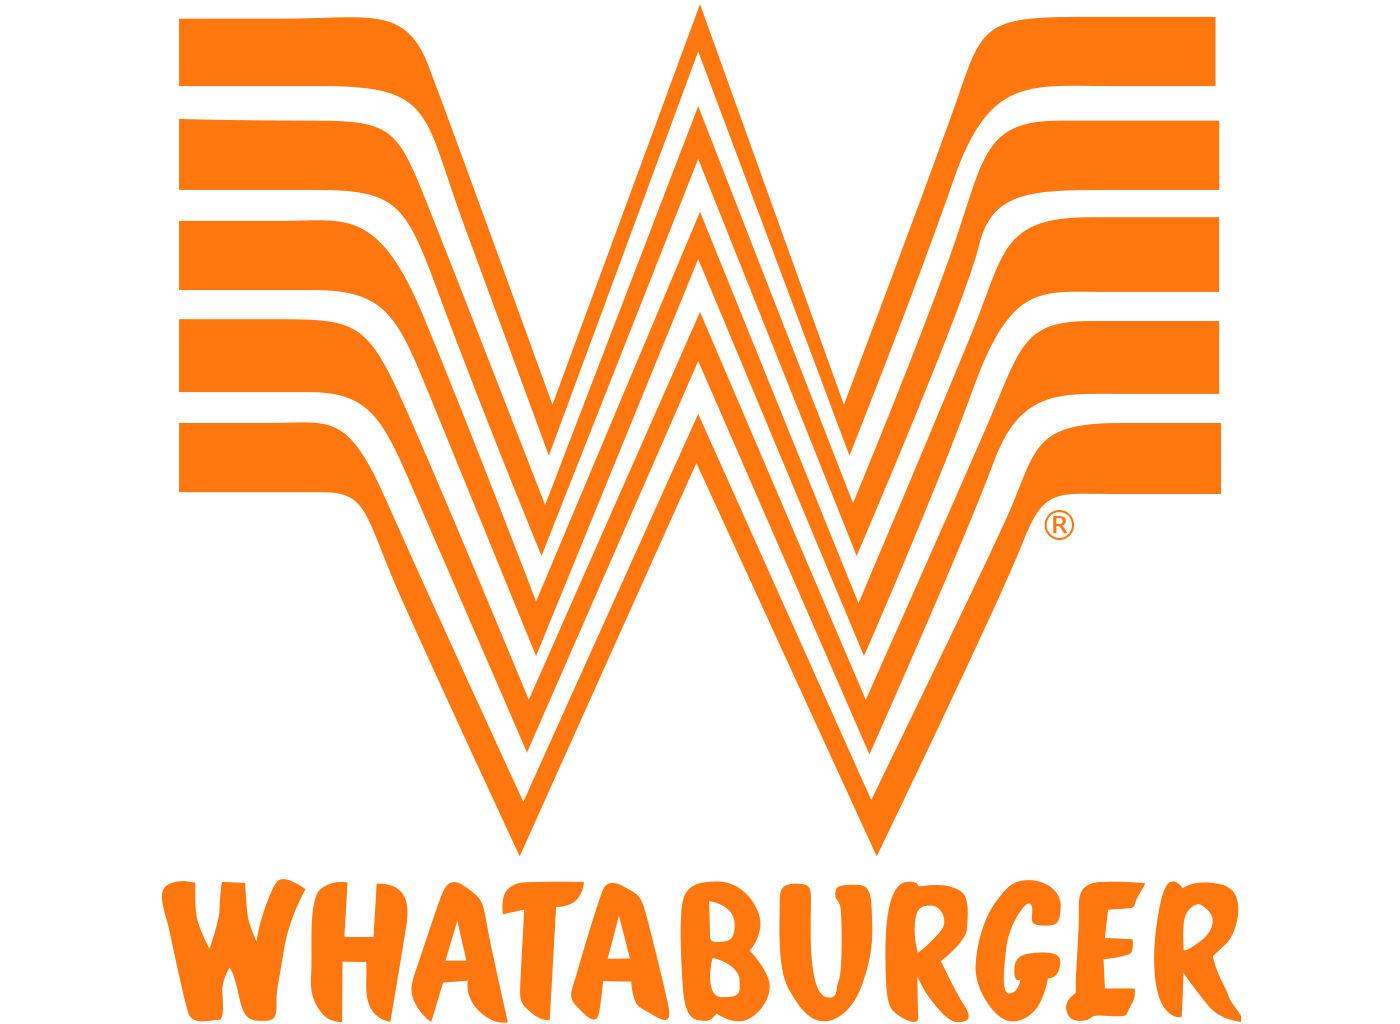 whataburger vs wonder woman dawn of logo theft eater burger clip art transparent burger clip art free images